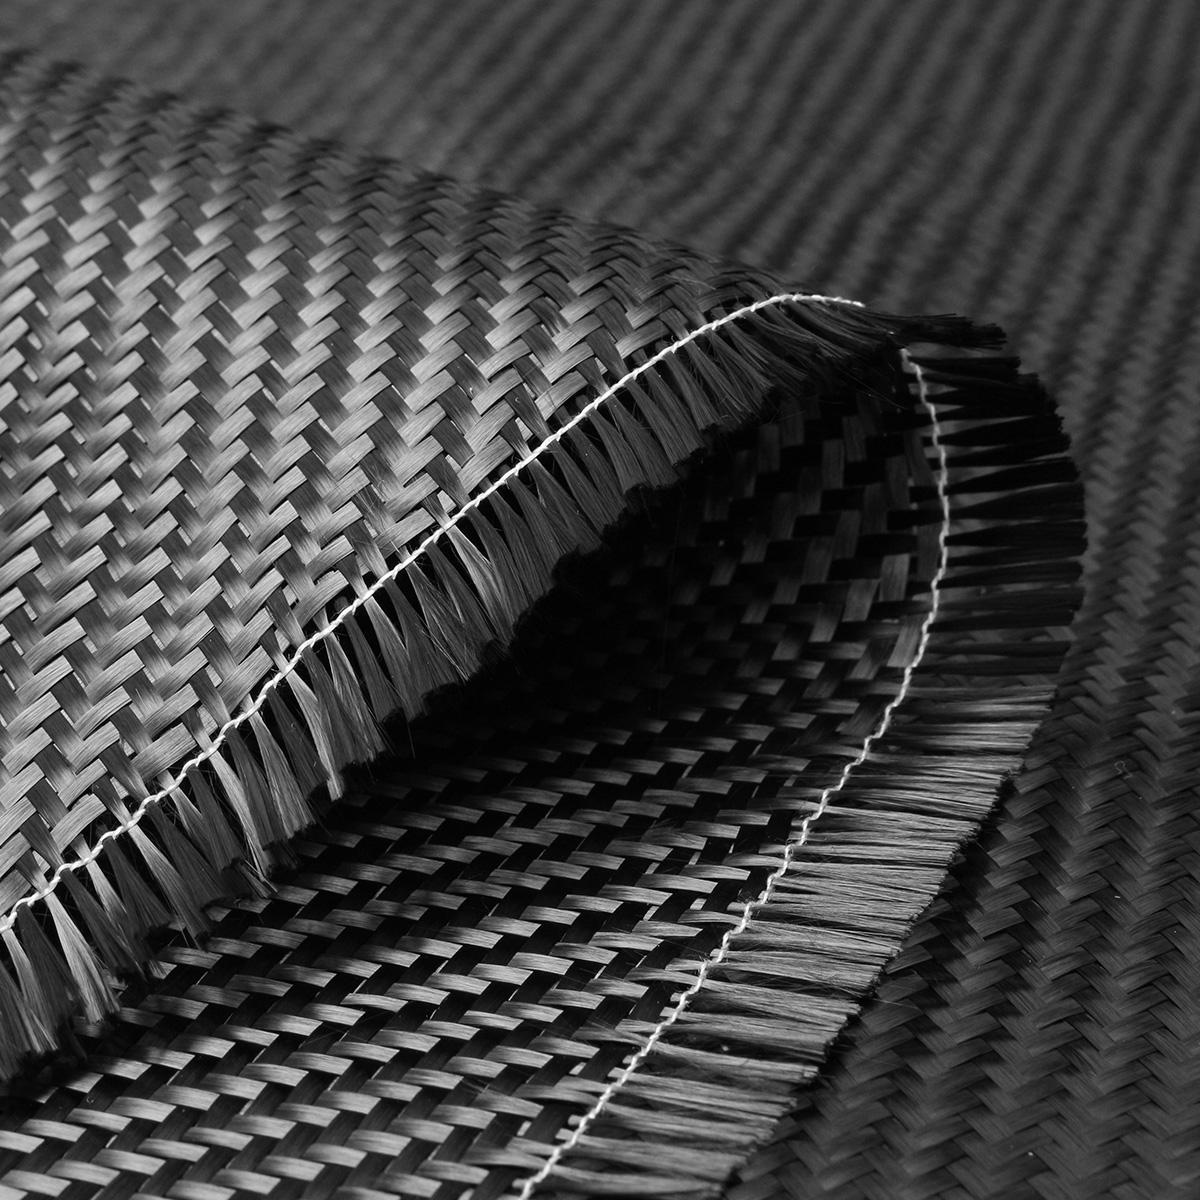 3K 200gsm Real Carbon Fiber Fibre Cloth Fabric 2//2 Twill Weave 60 x  Gift